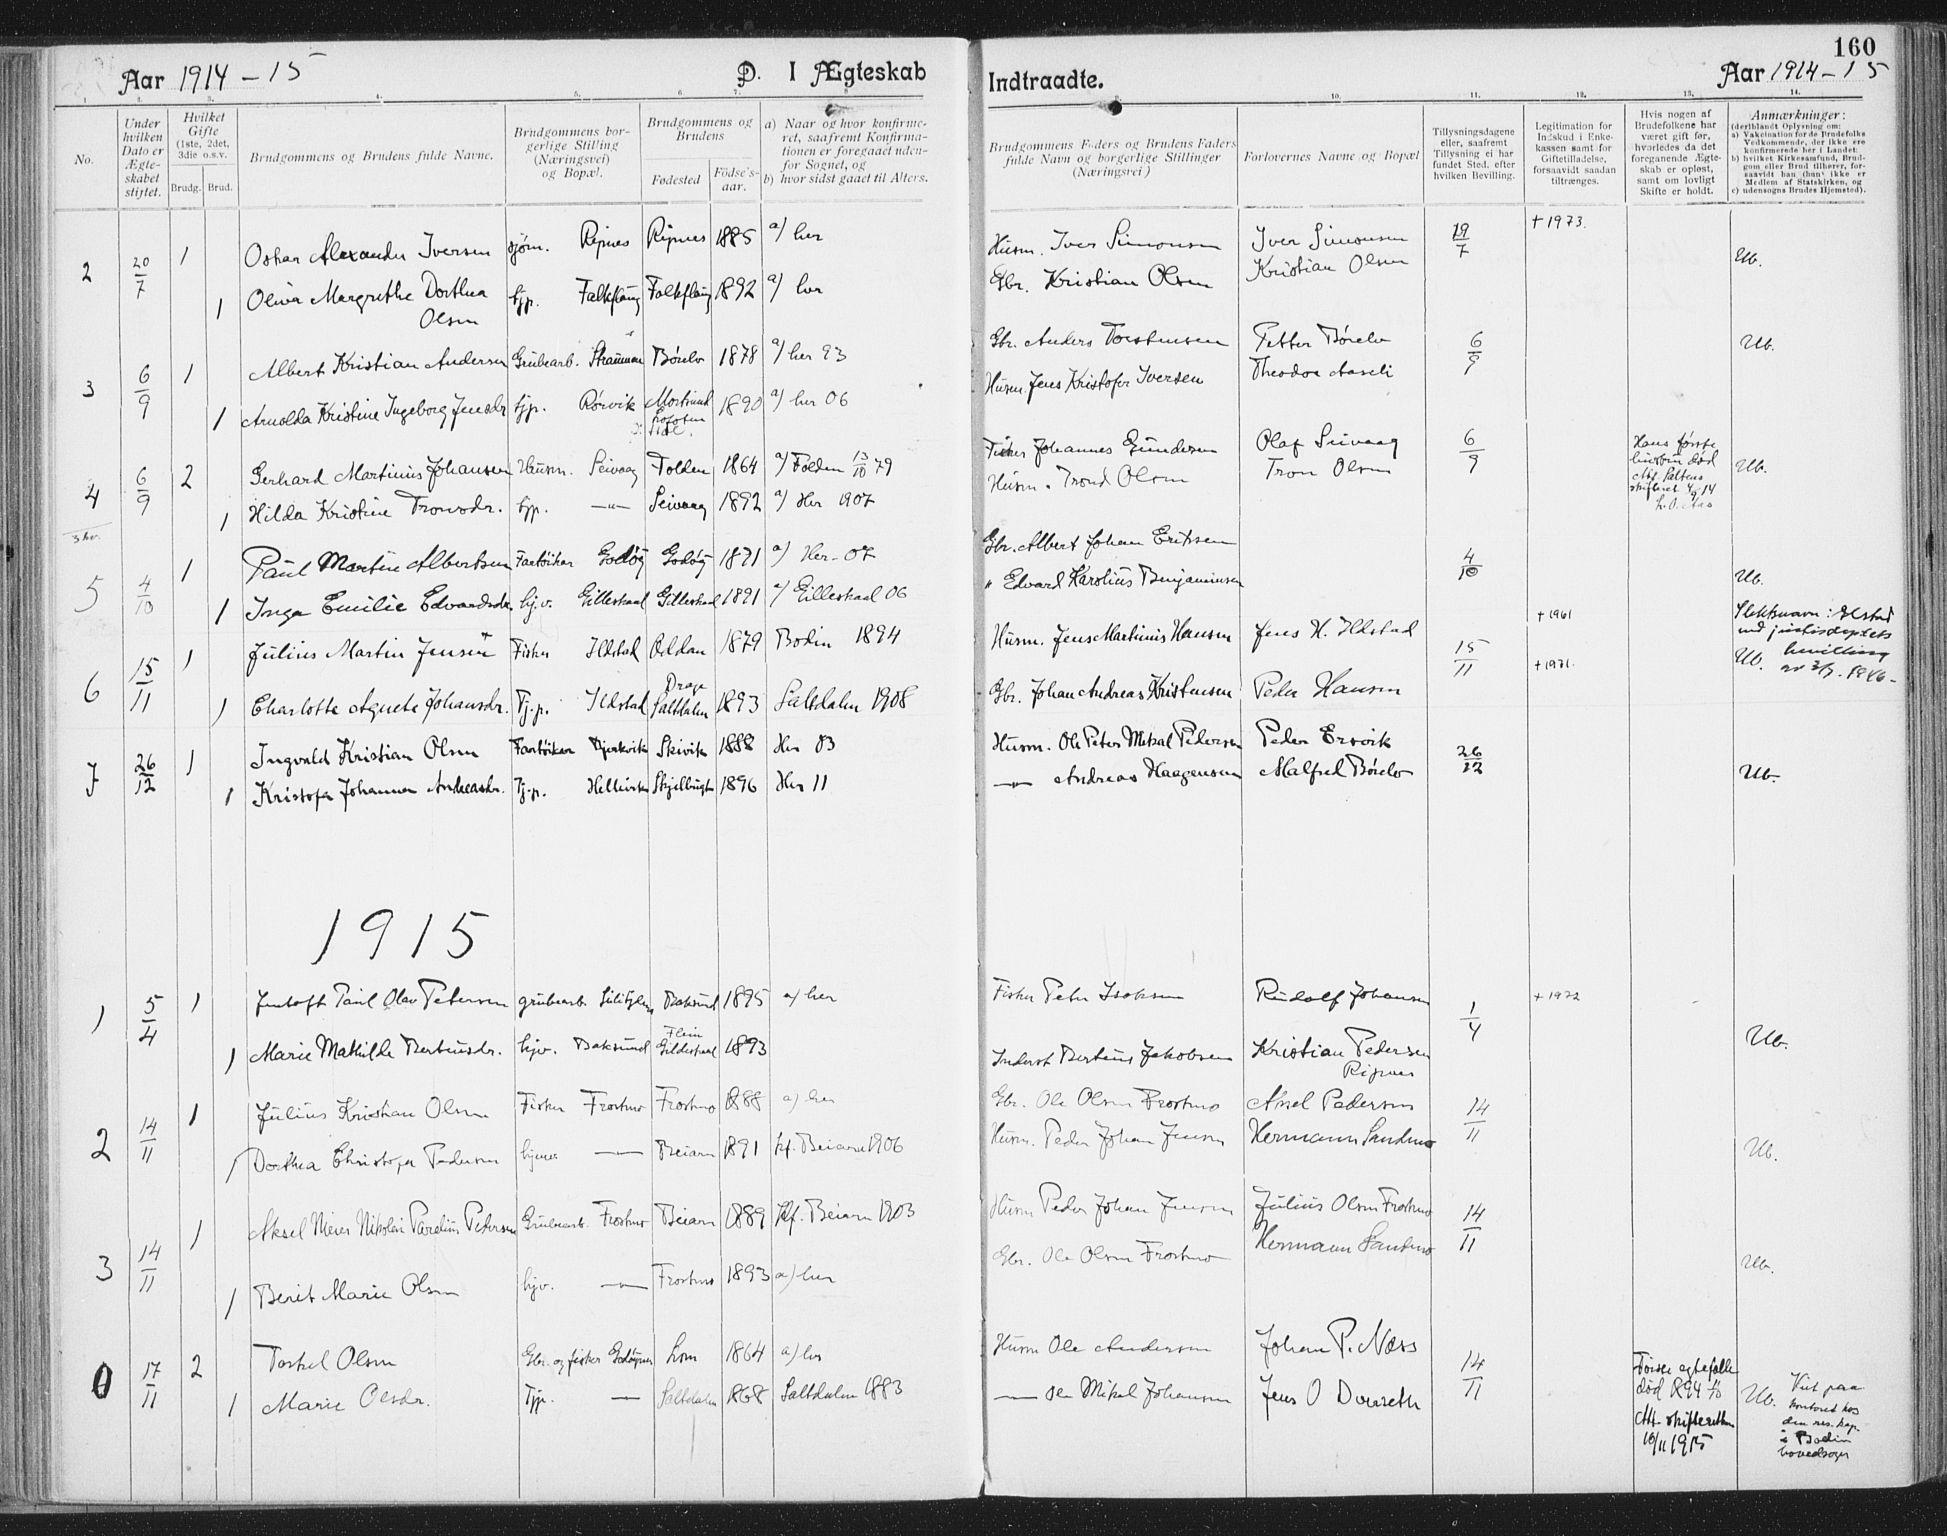 SAT, Ministerialprotokoller, klokkerbøker og fødselsregistre - Nordland, 804/L0081: Ministerialbok nr. 804A02, 1901-1915, s. 160